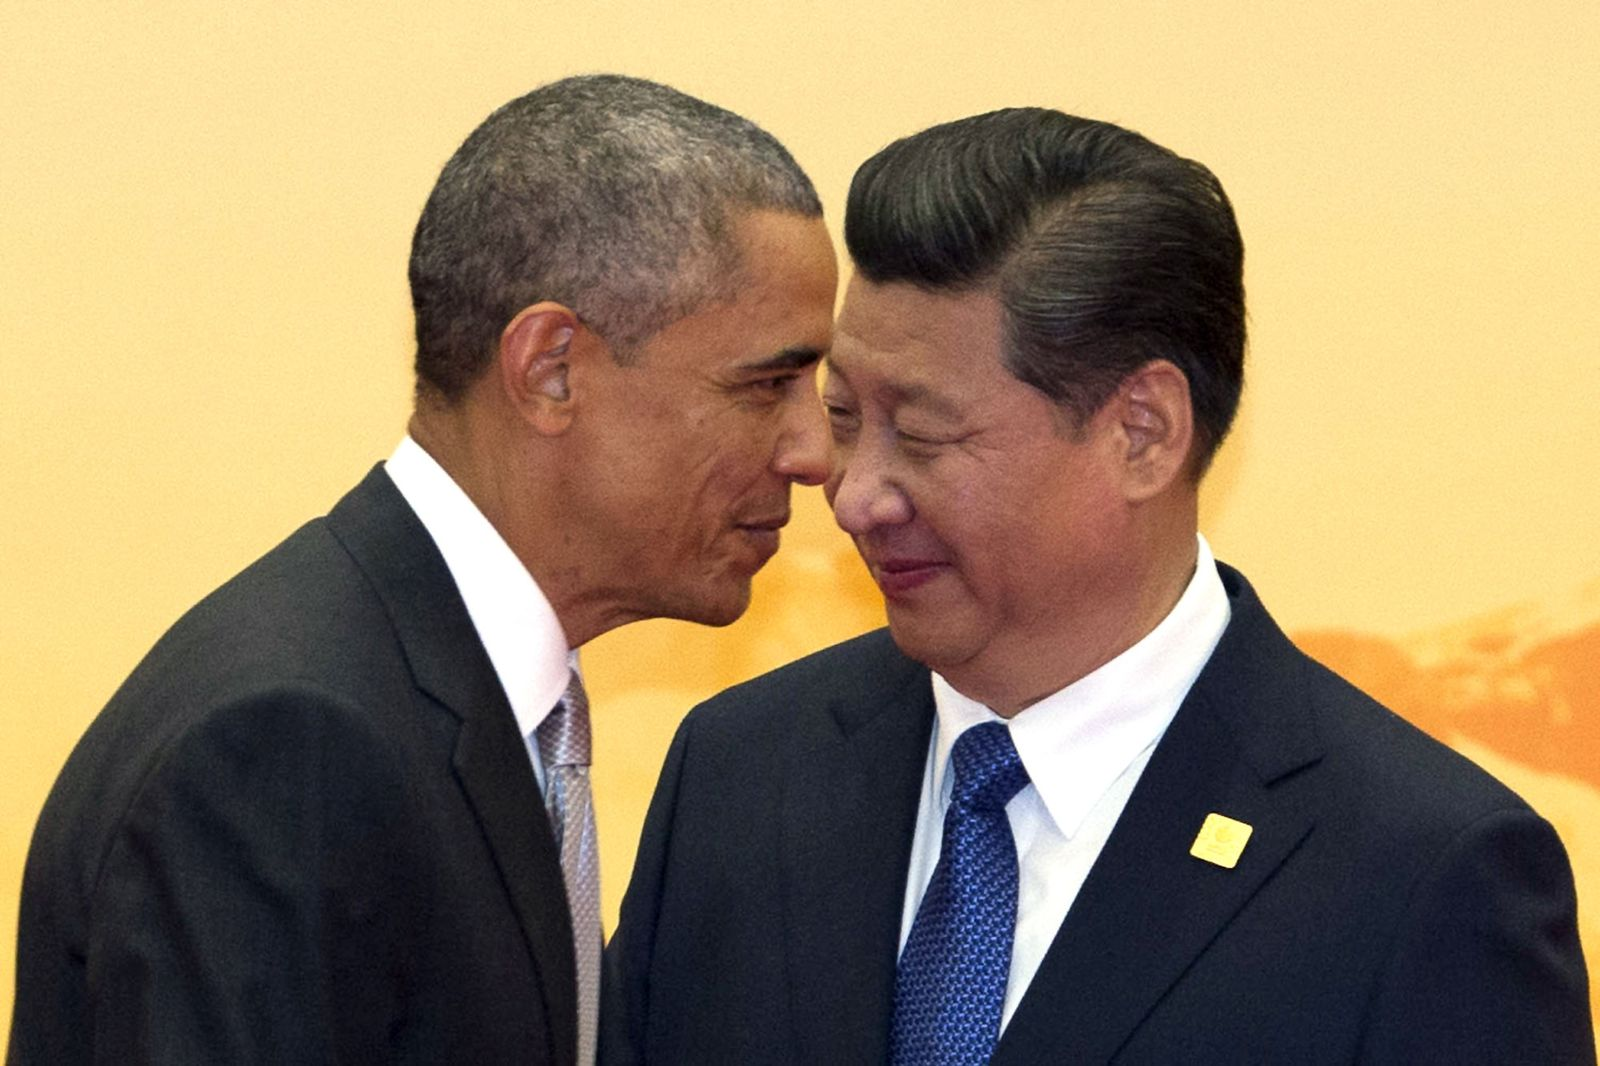 Barack Obama Xi Jinping APEC-Gipfel